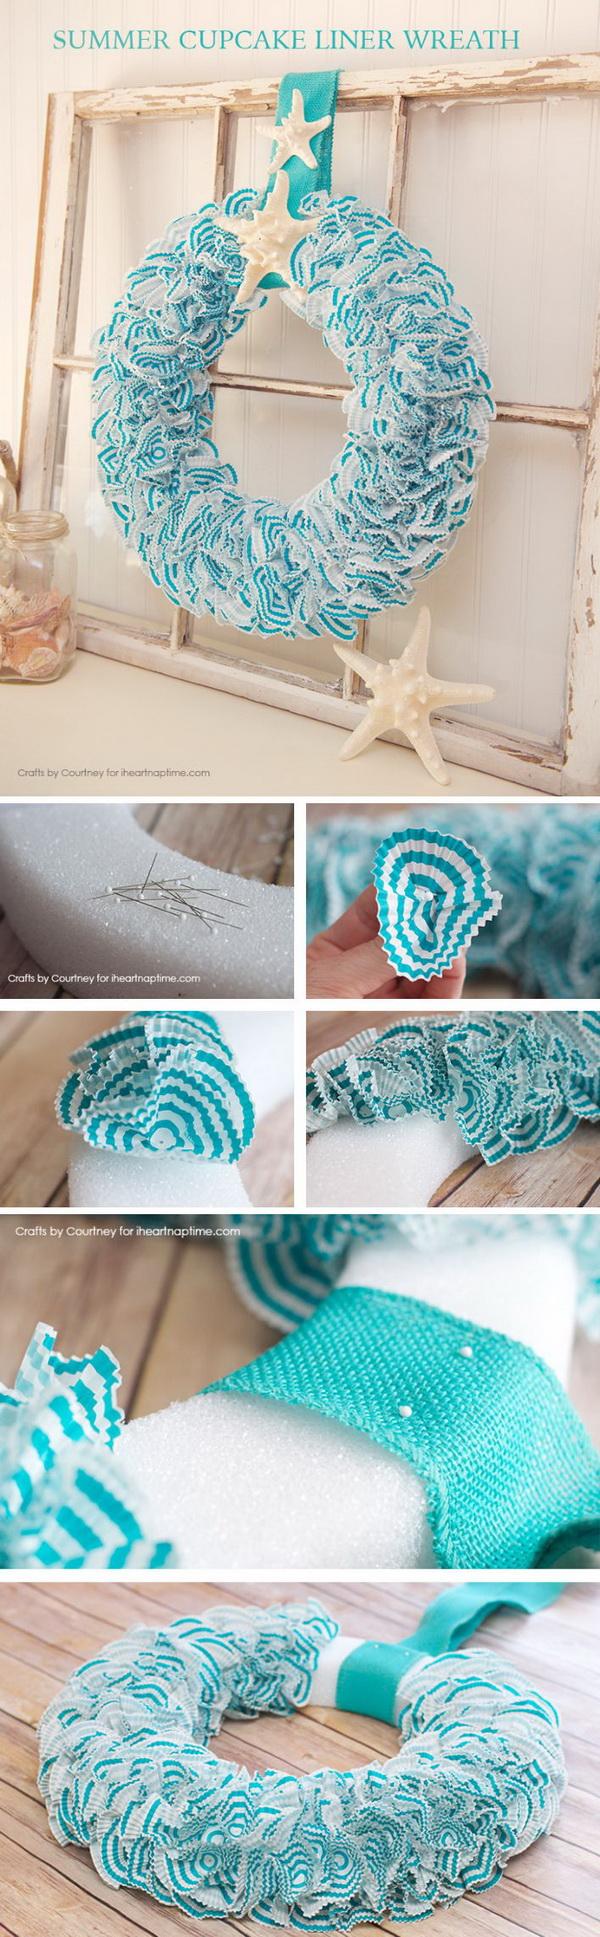 DIY Nautical Wreath With Cupcake Liners And Seashells.